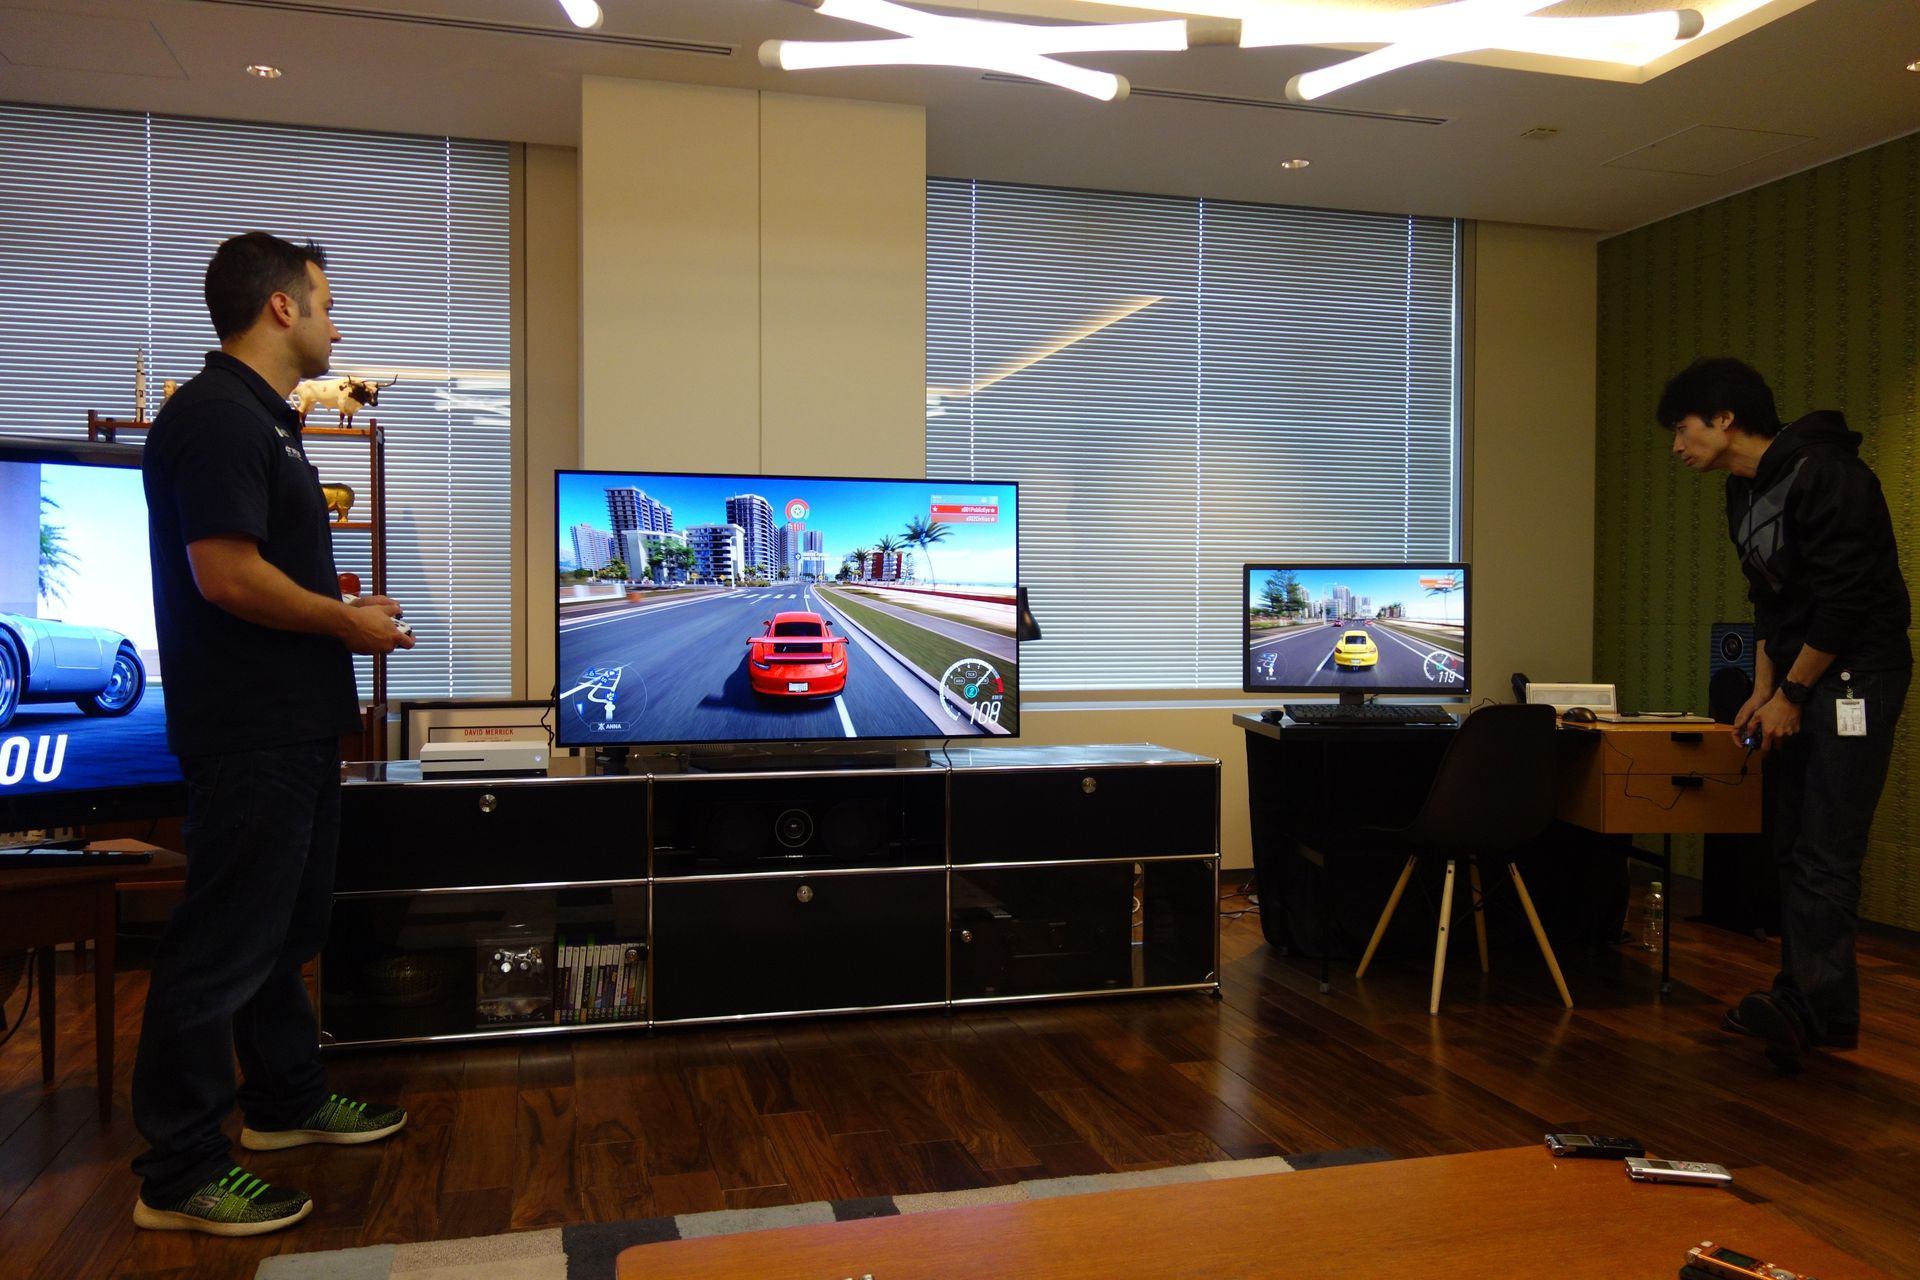 Windows 10 PCとXbox Oneによるクロスプラットフォームプレイのデモ